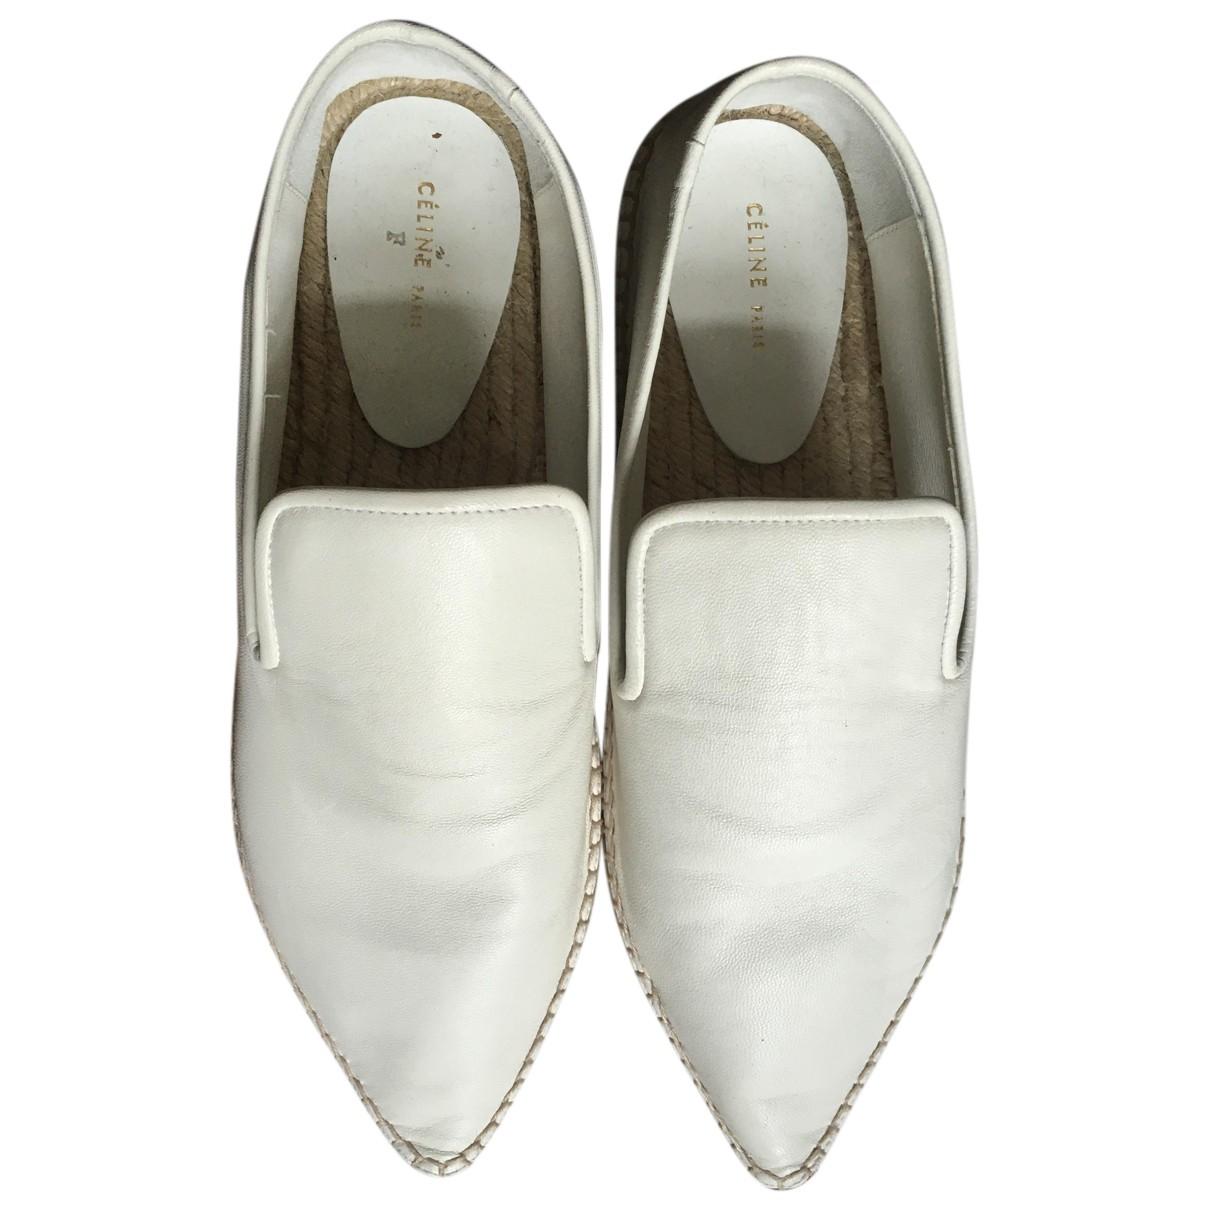 Celine N White Leather Espadrilles for Women 38 EU